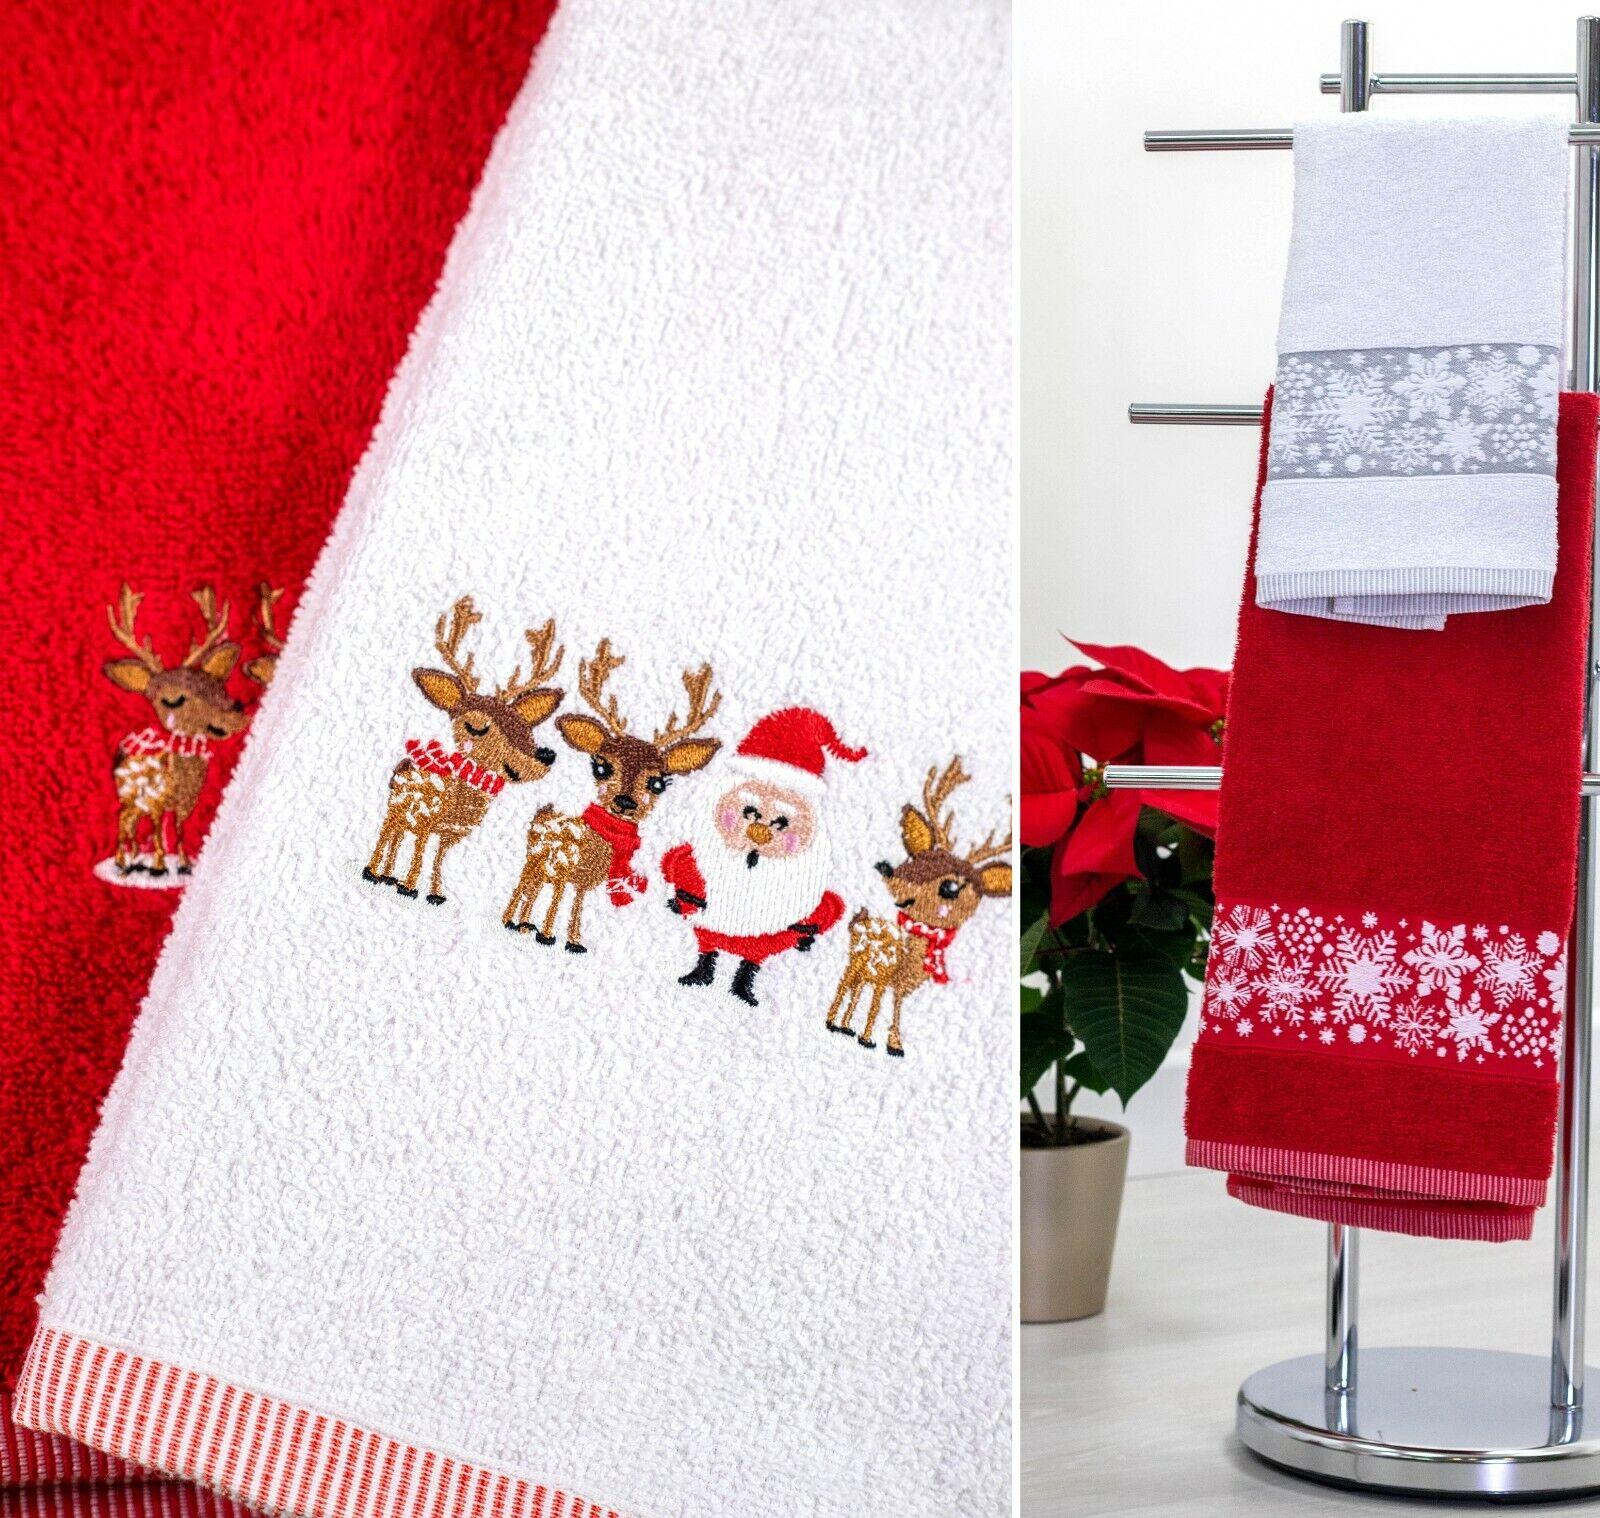 Christmas Hand Guest Kitchen Towel Set 100 Cotton Luxury Embroidered Design Ebay